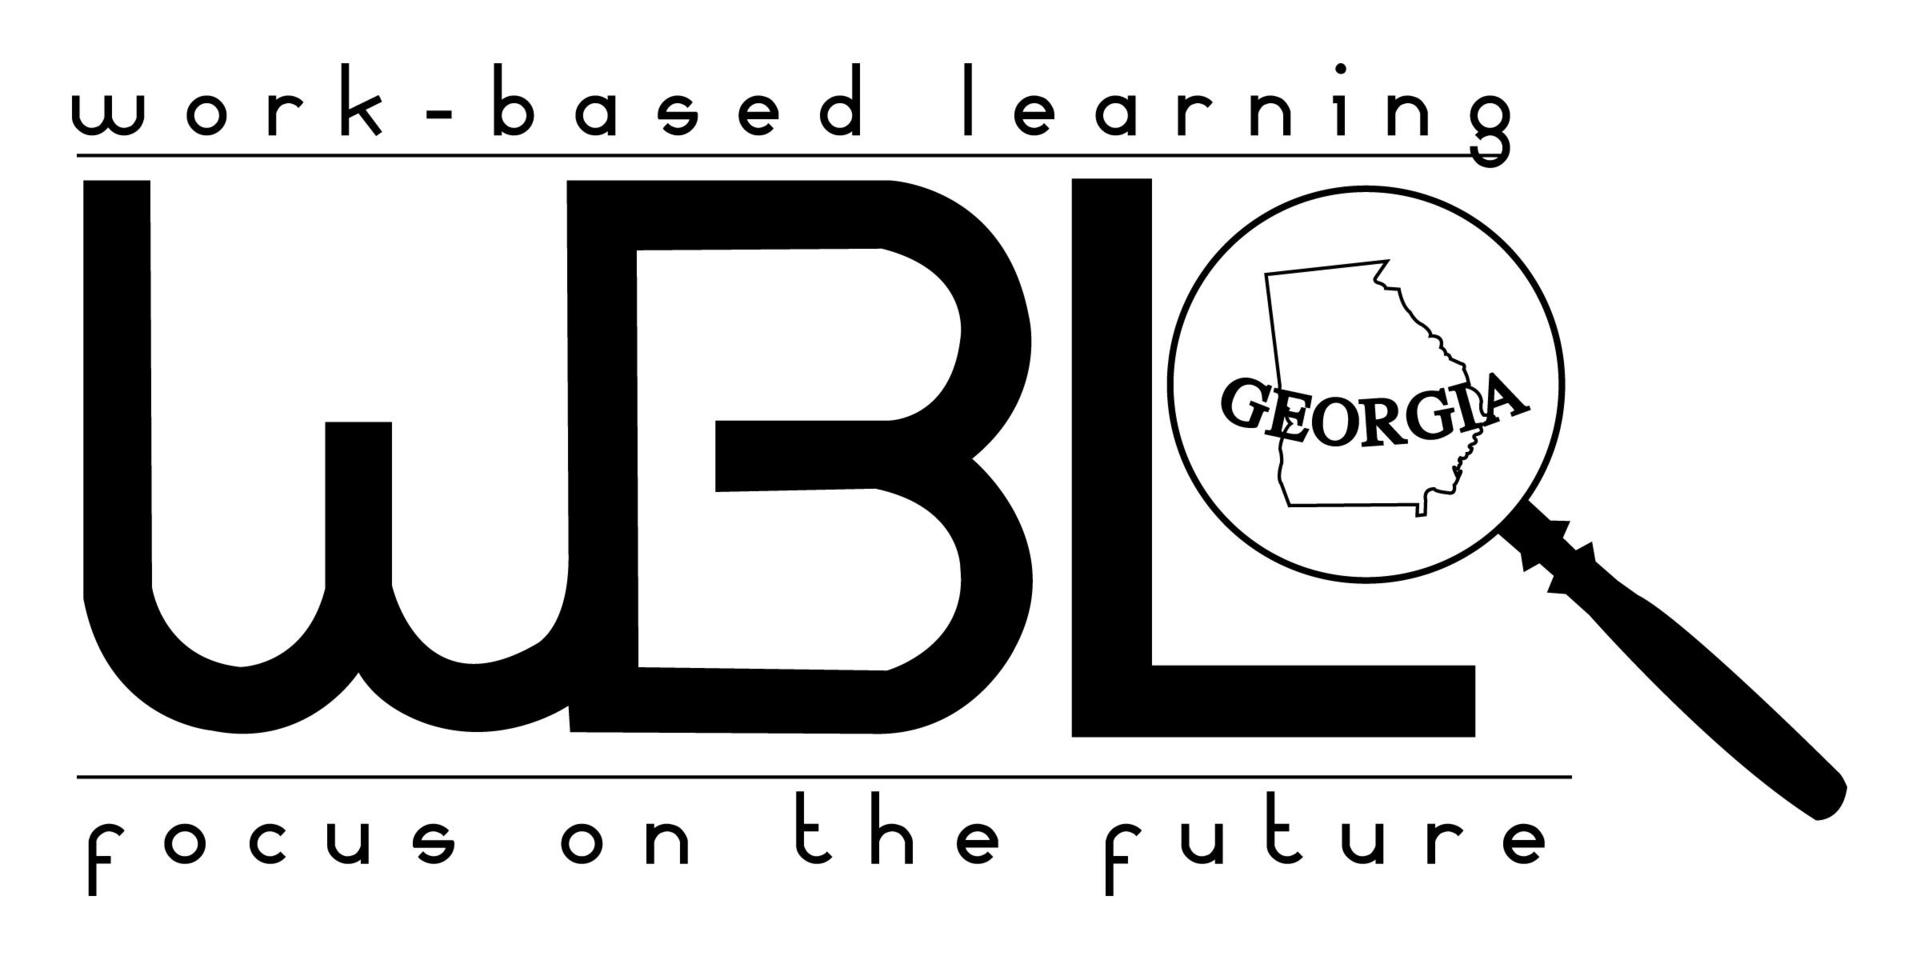 work-based learning logo